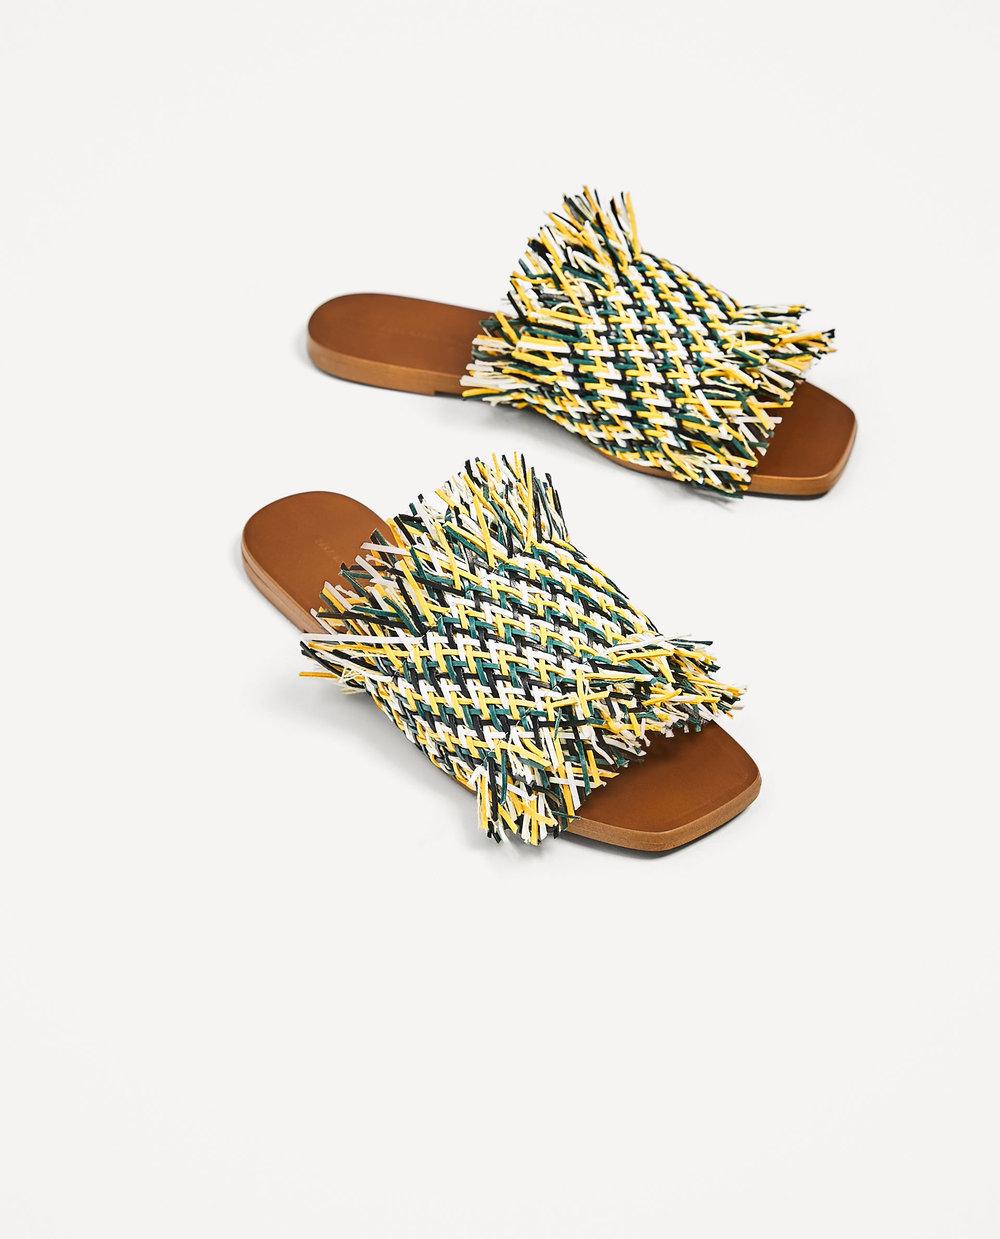 Ph: Zara, Multicolored Flat Braided Slides